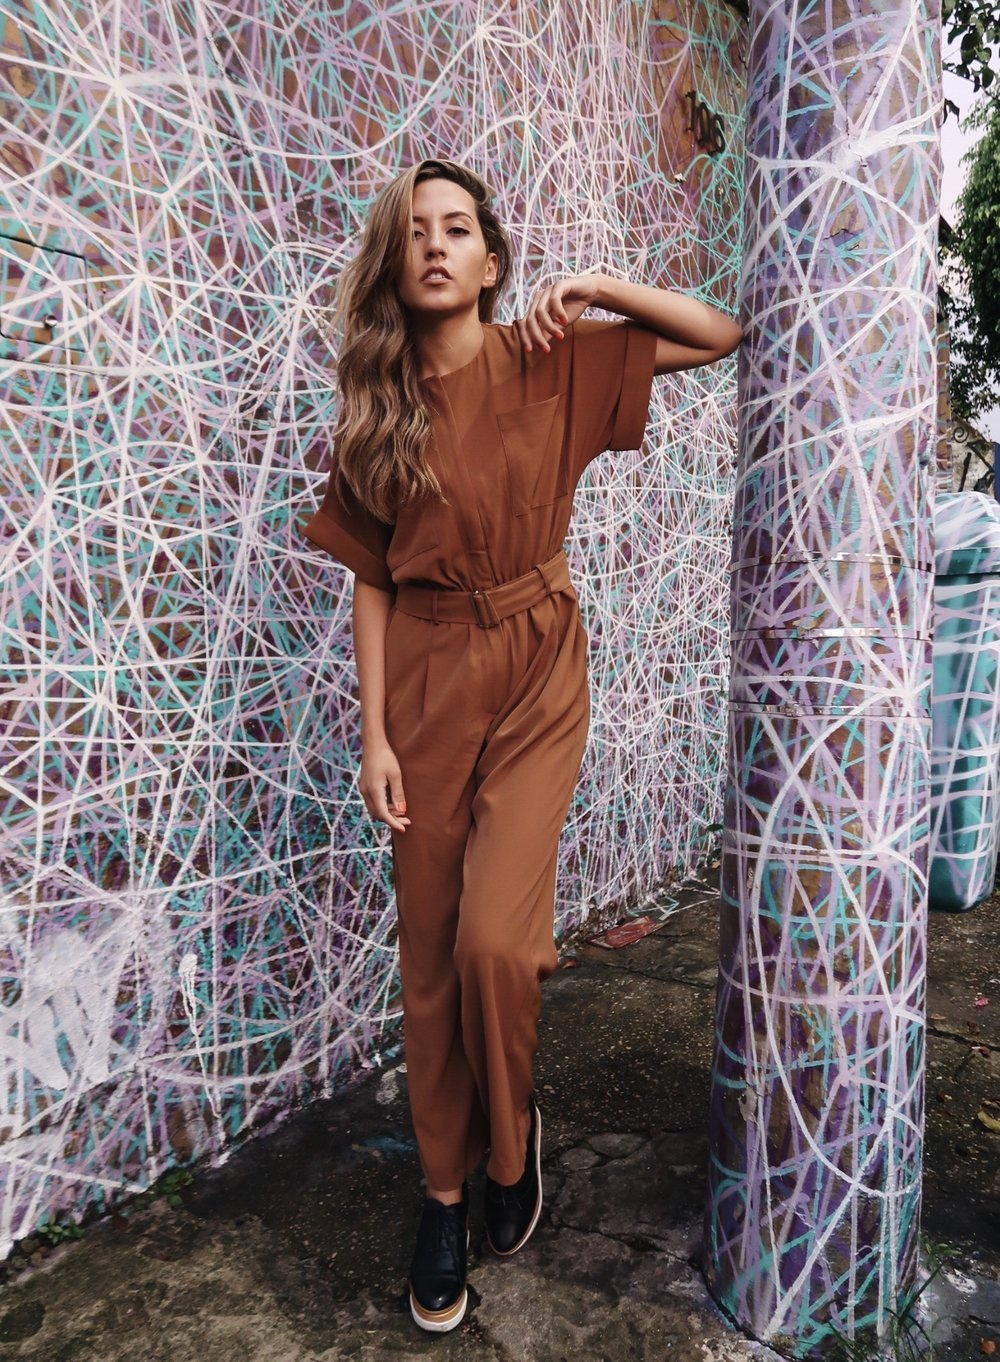 fashion-blogger-raquel-paiva-wears-jumpsuit-stylewe-beco-do-batman